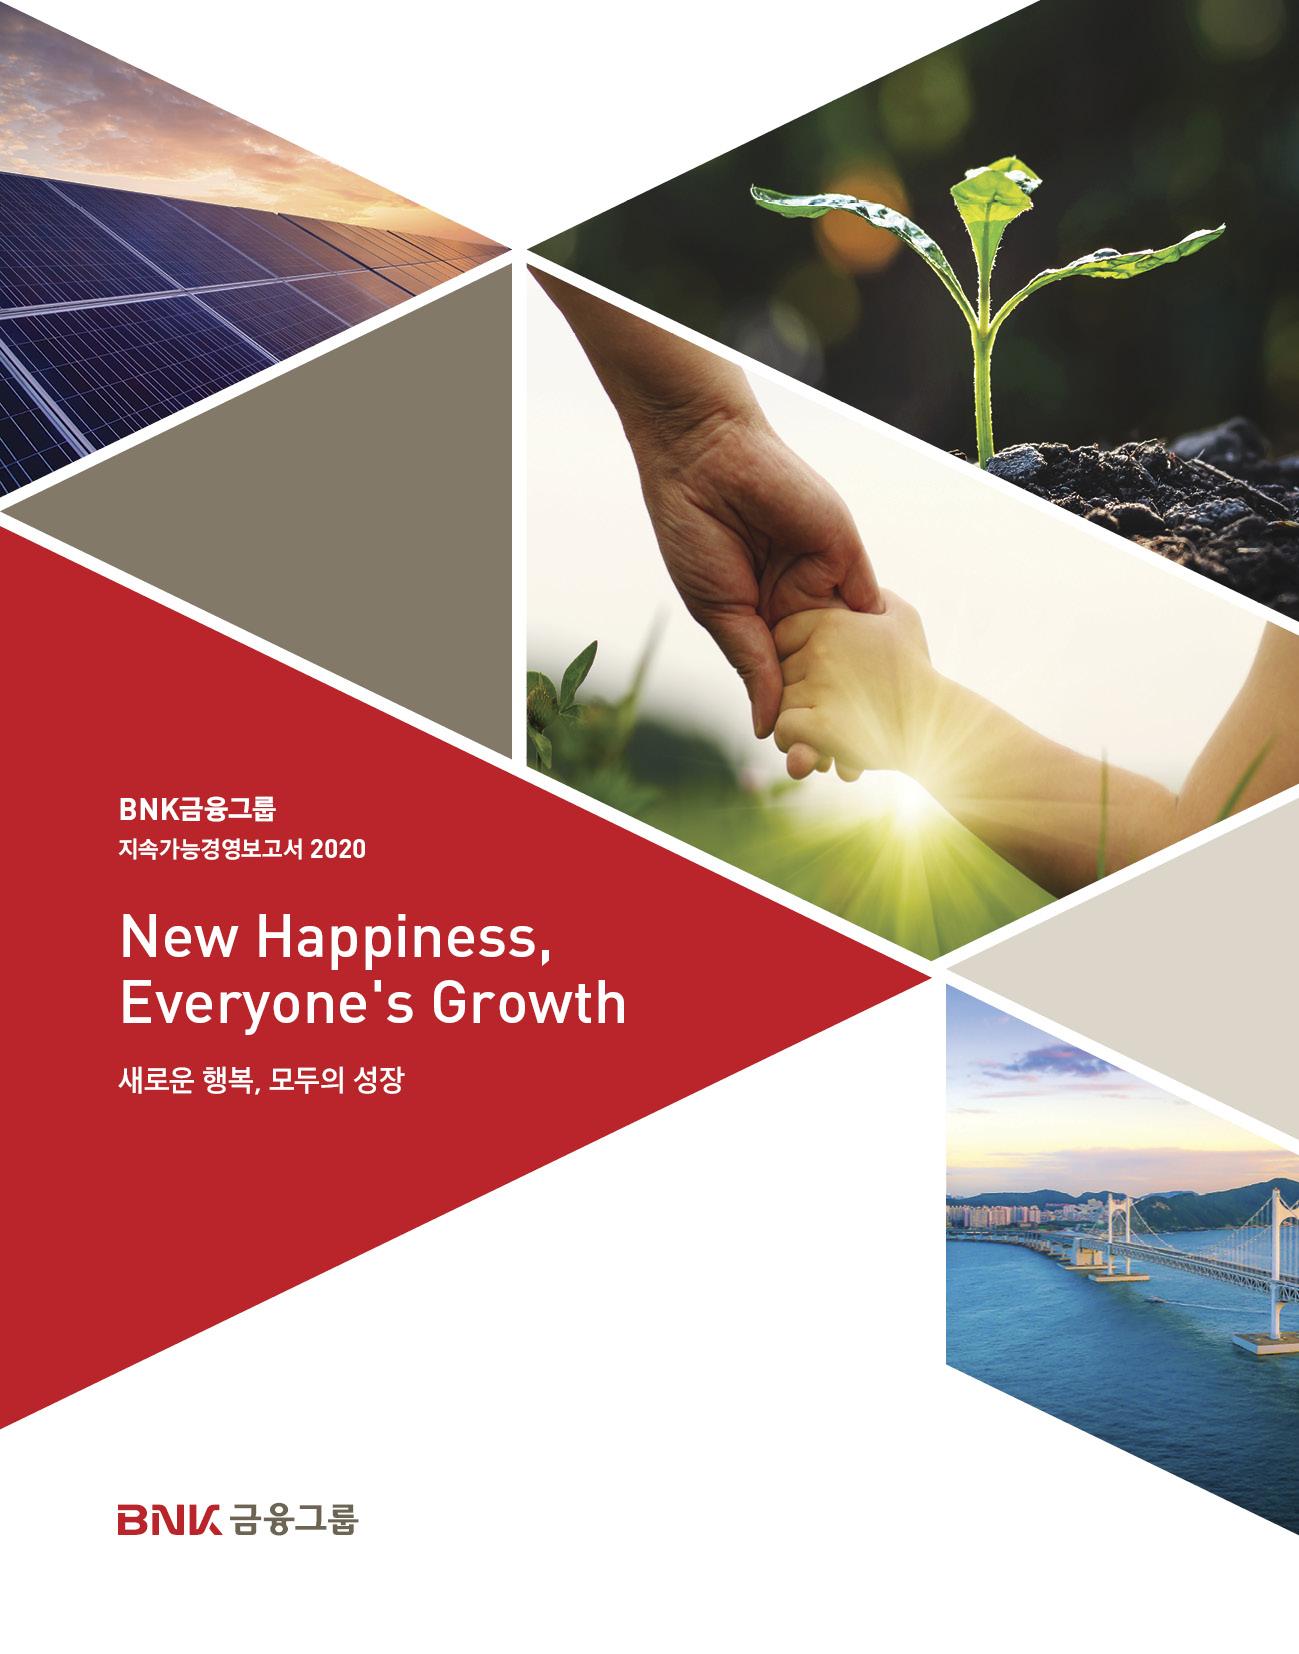 BNK금융그룹 지속가능경영보고서 2020 표지